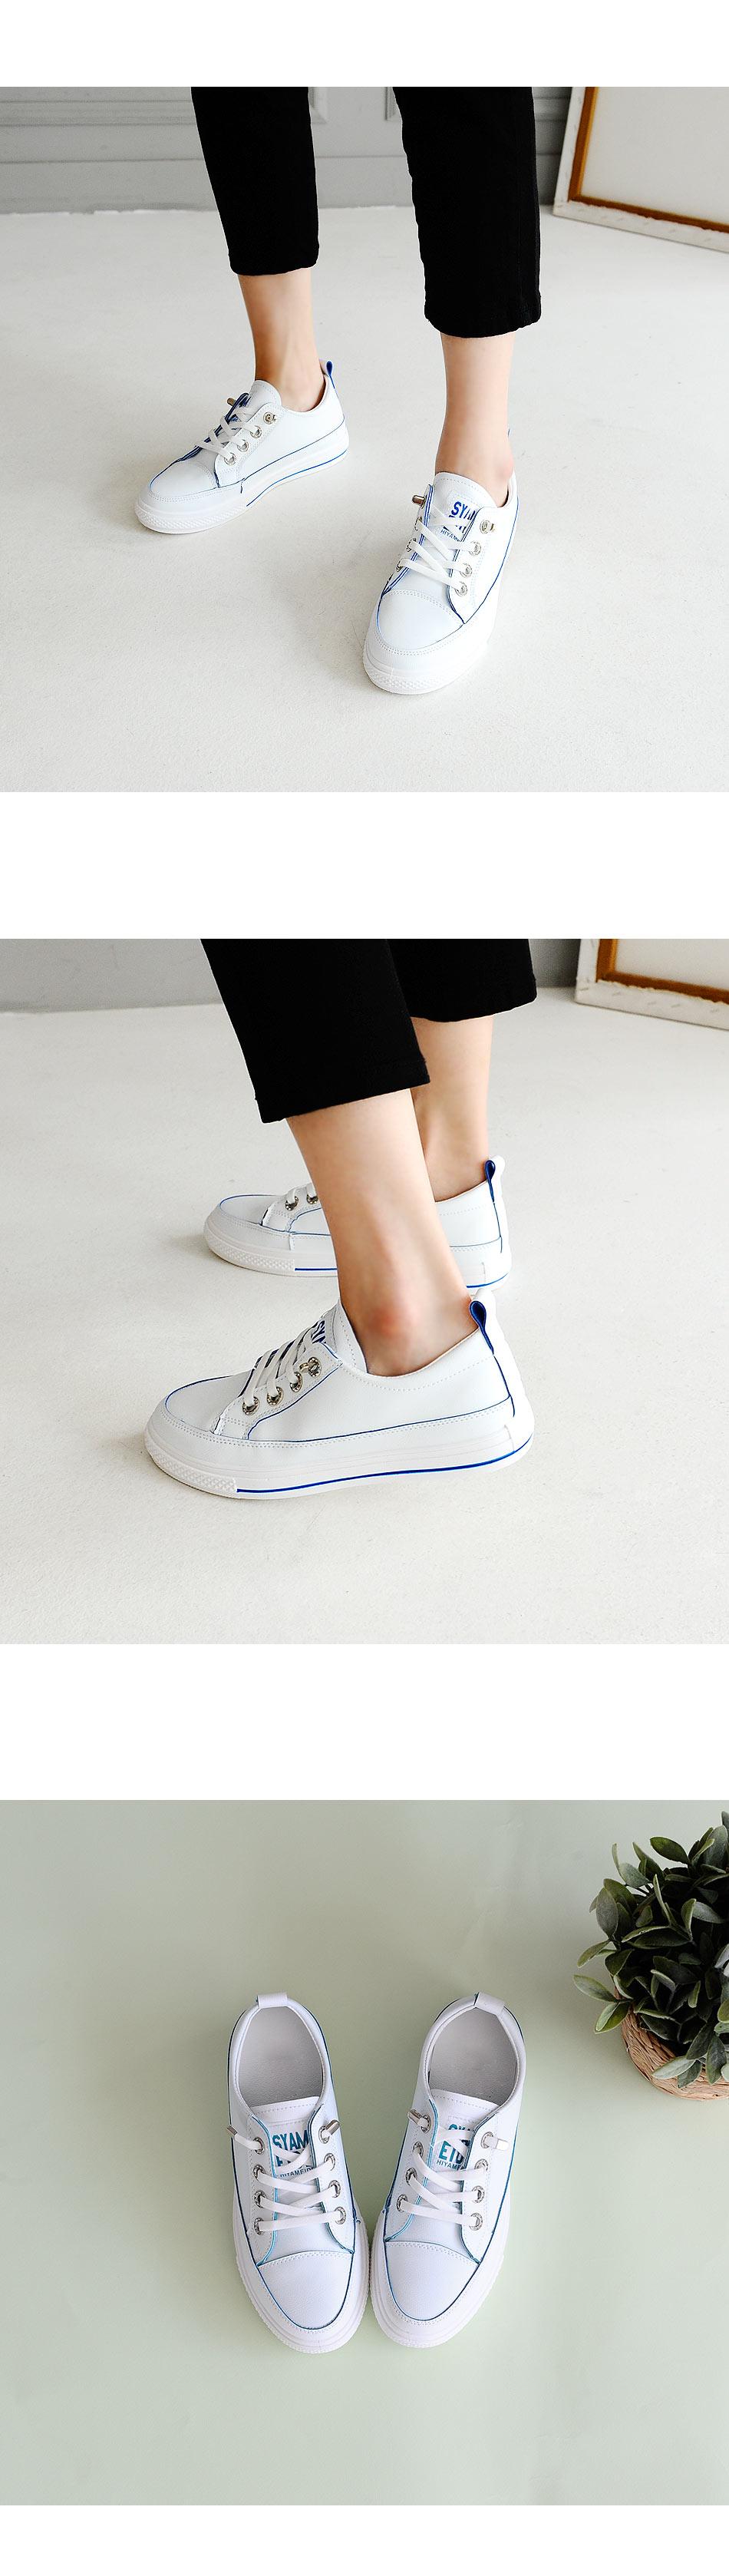 Rubans sneakers 3cm